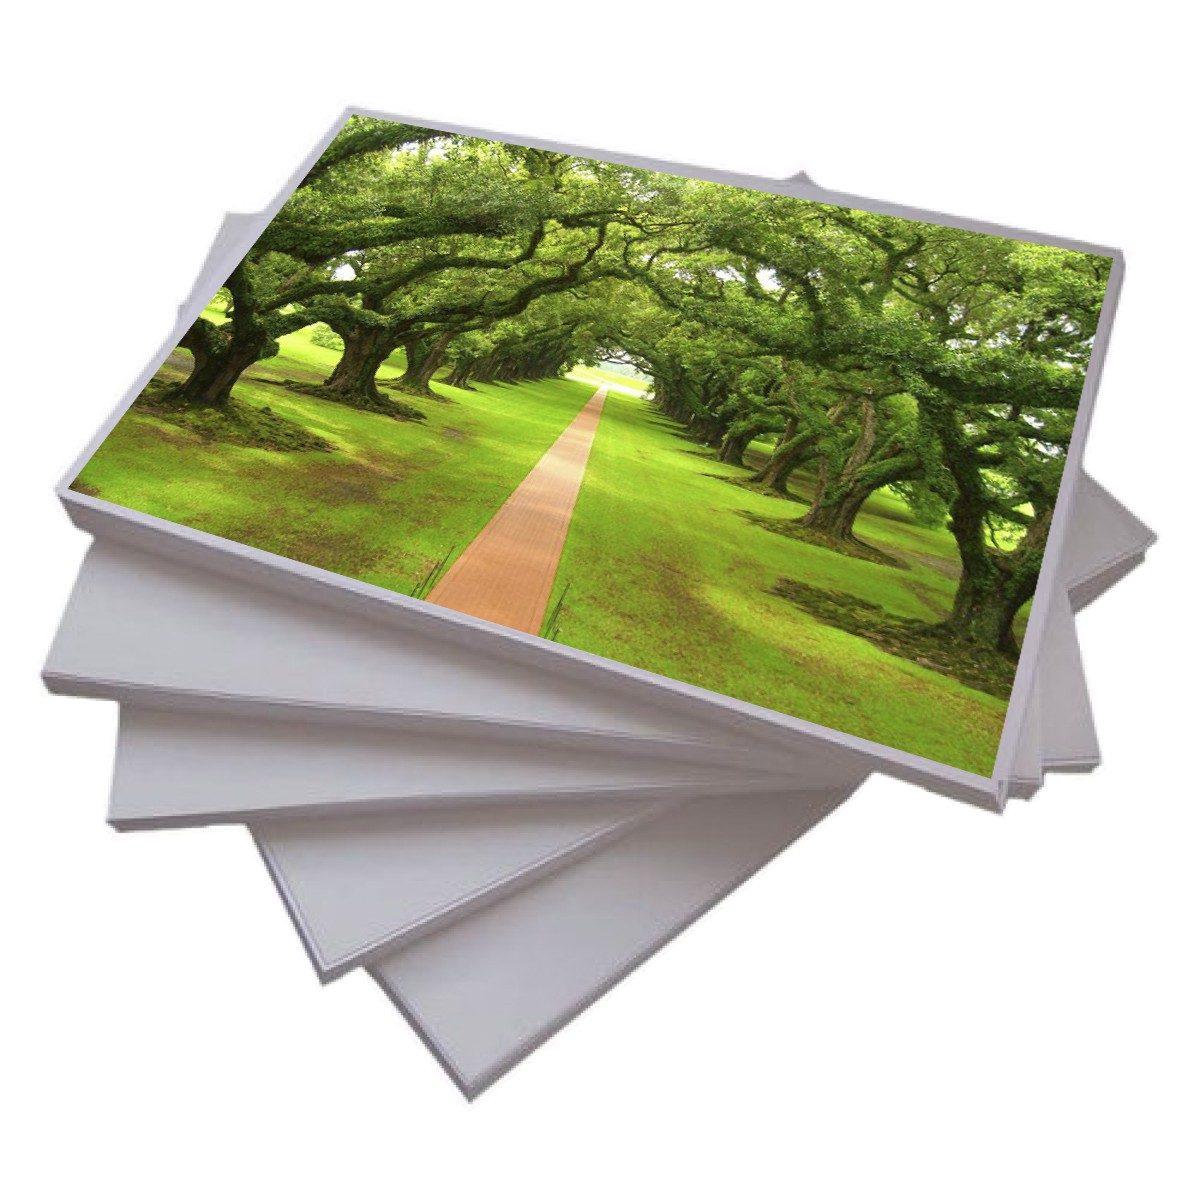 Papel 240gr Foto 100 Folhas A4 Glossy A Prova Dagua